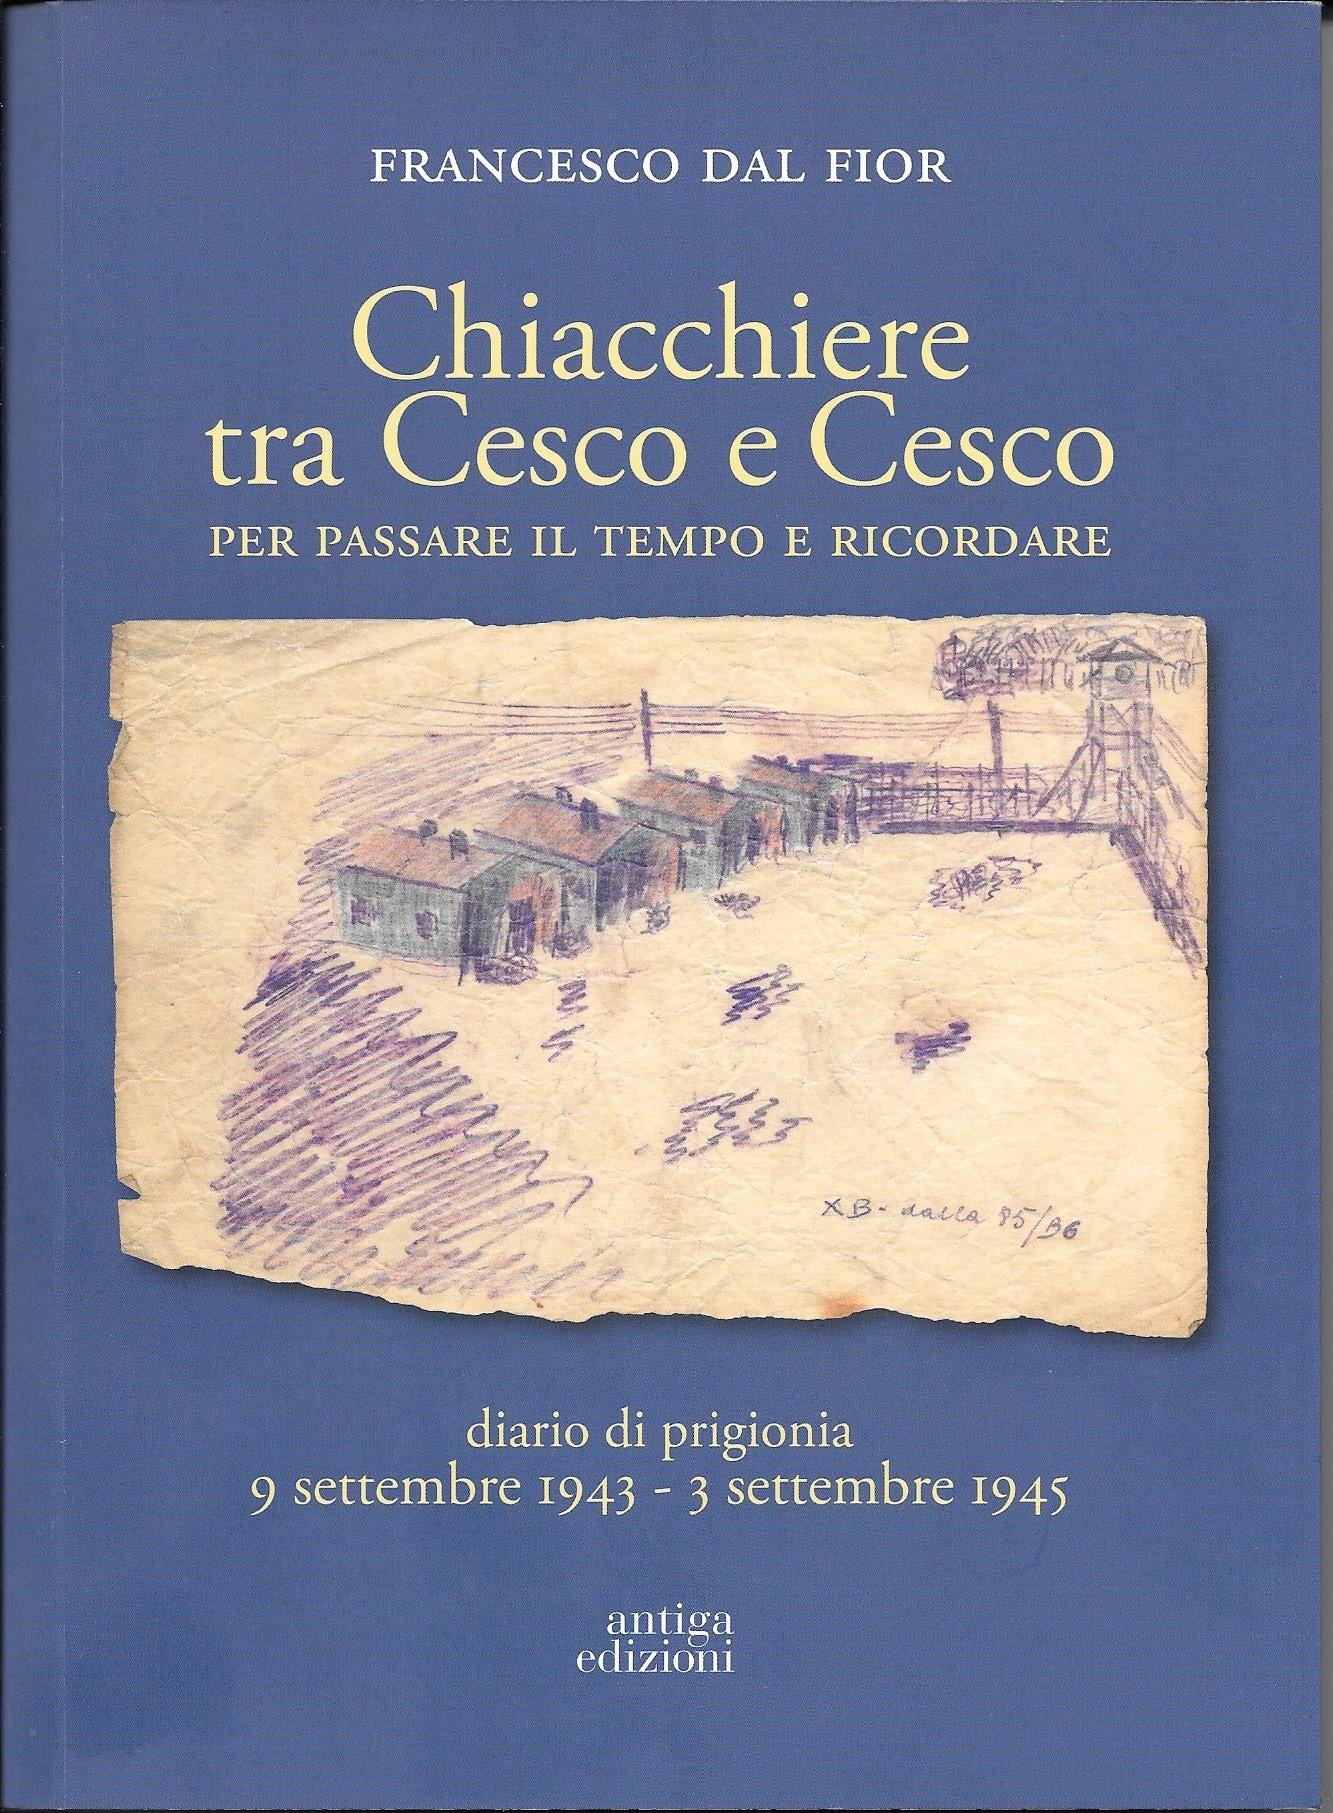 Chiacchiere tra Cesco e Cesco